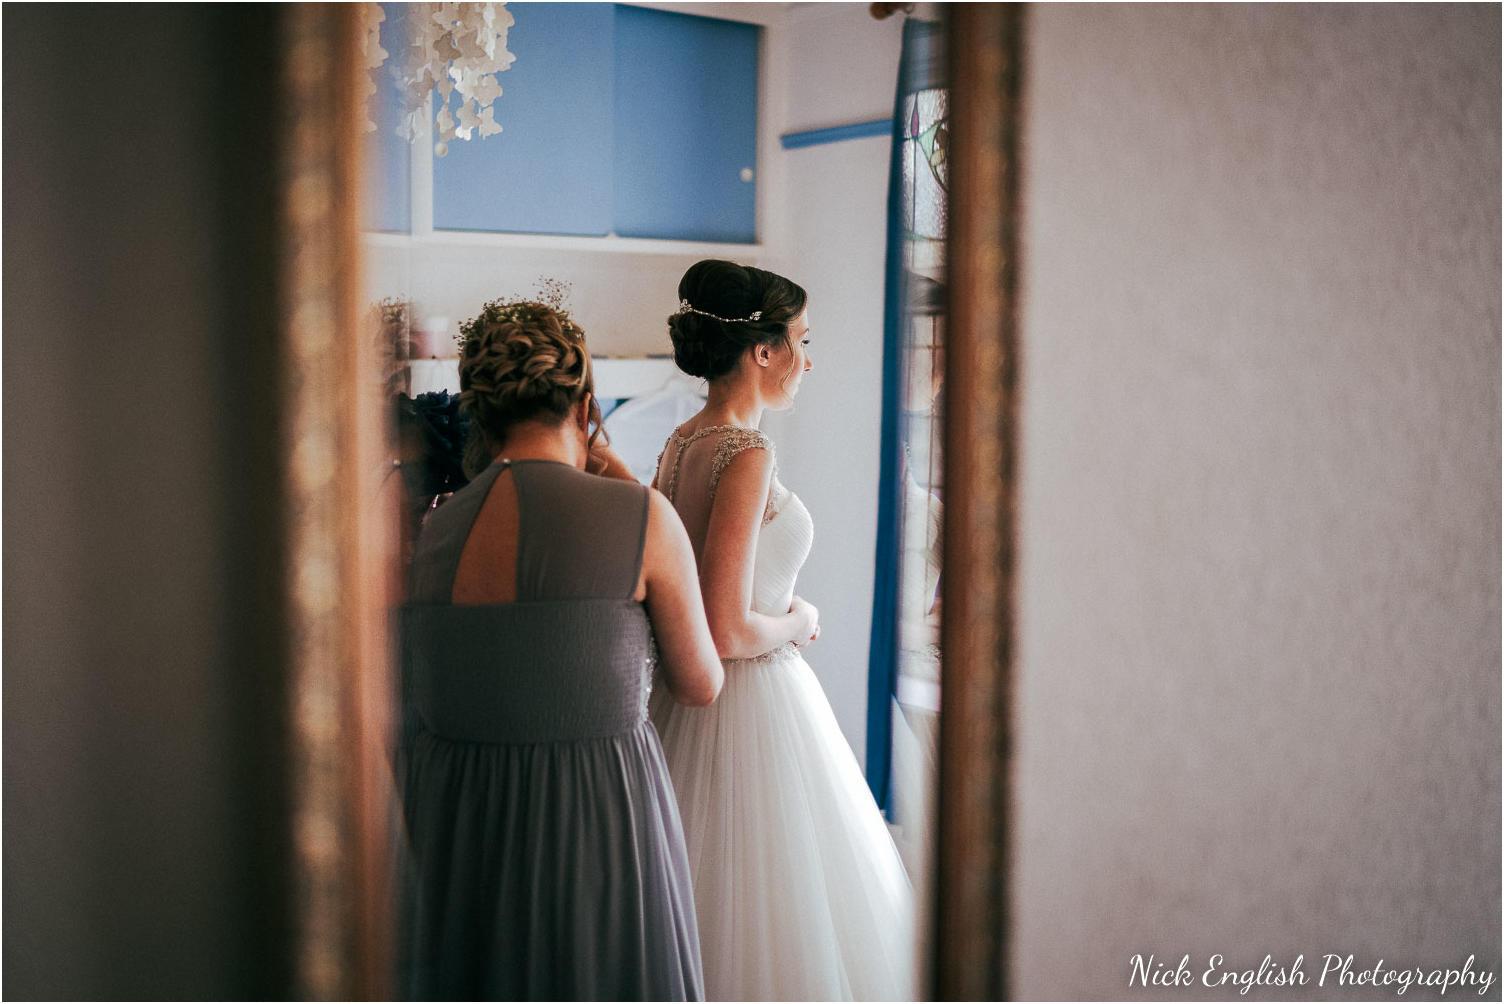 Mitton_Hall_Wedding_Photographer-12.jpg